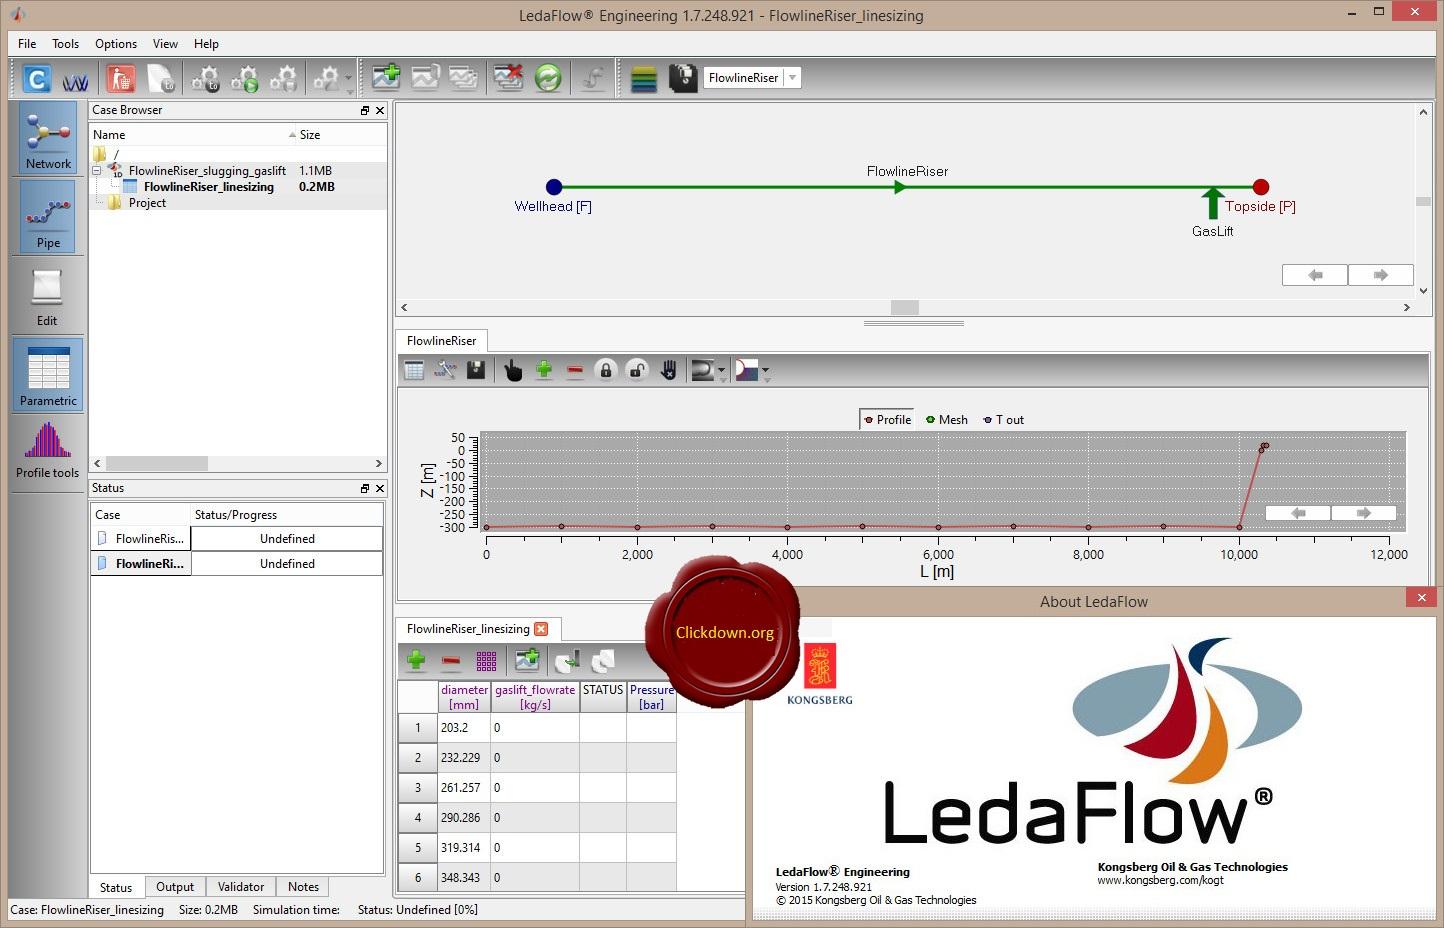 Working with Kongsberg LedaFlow Engineering 1.7.248.921 full